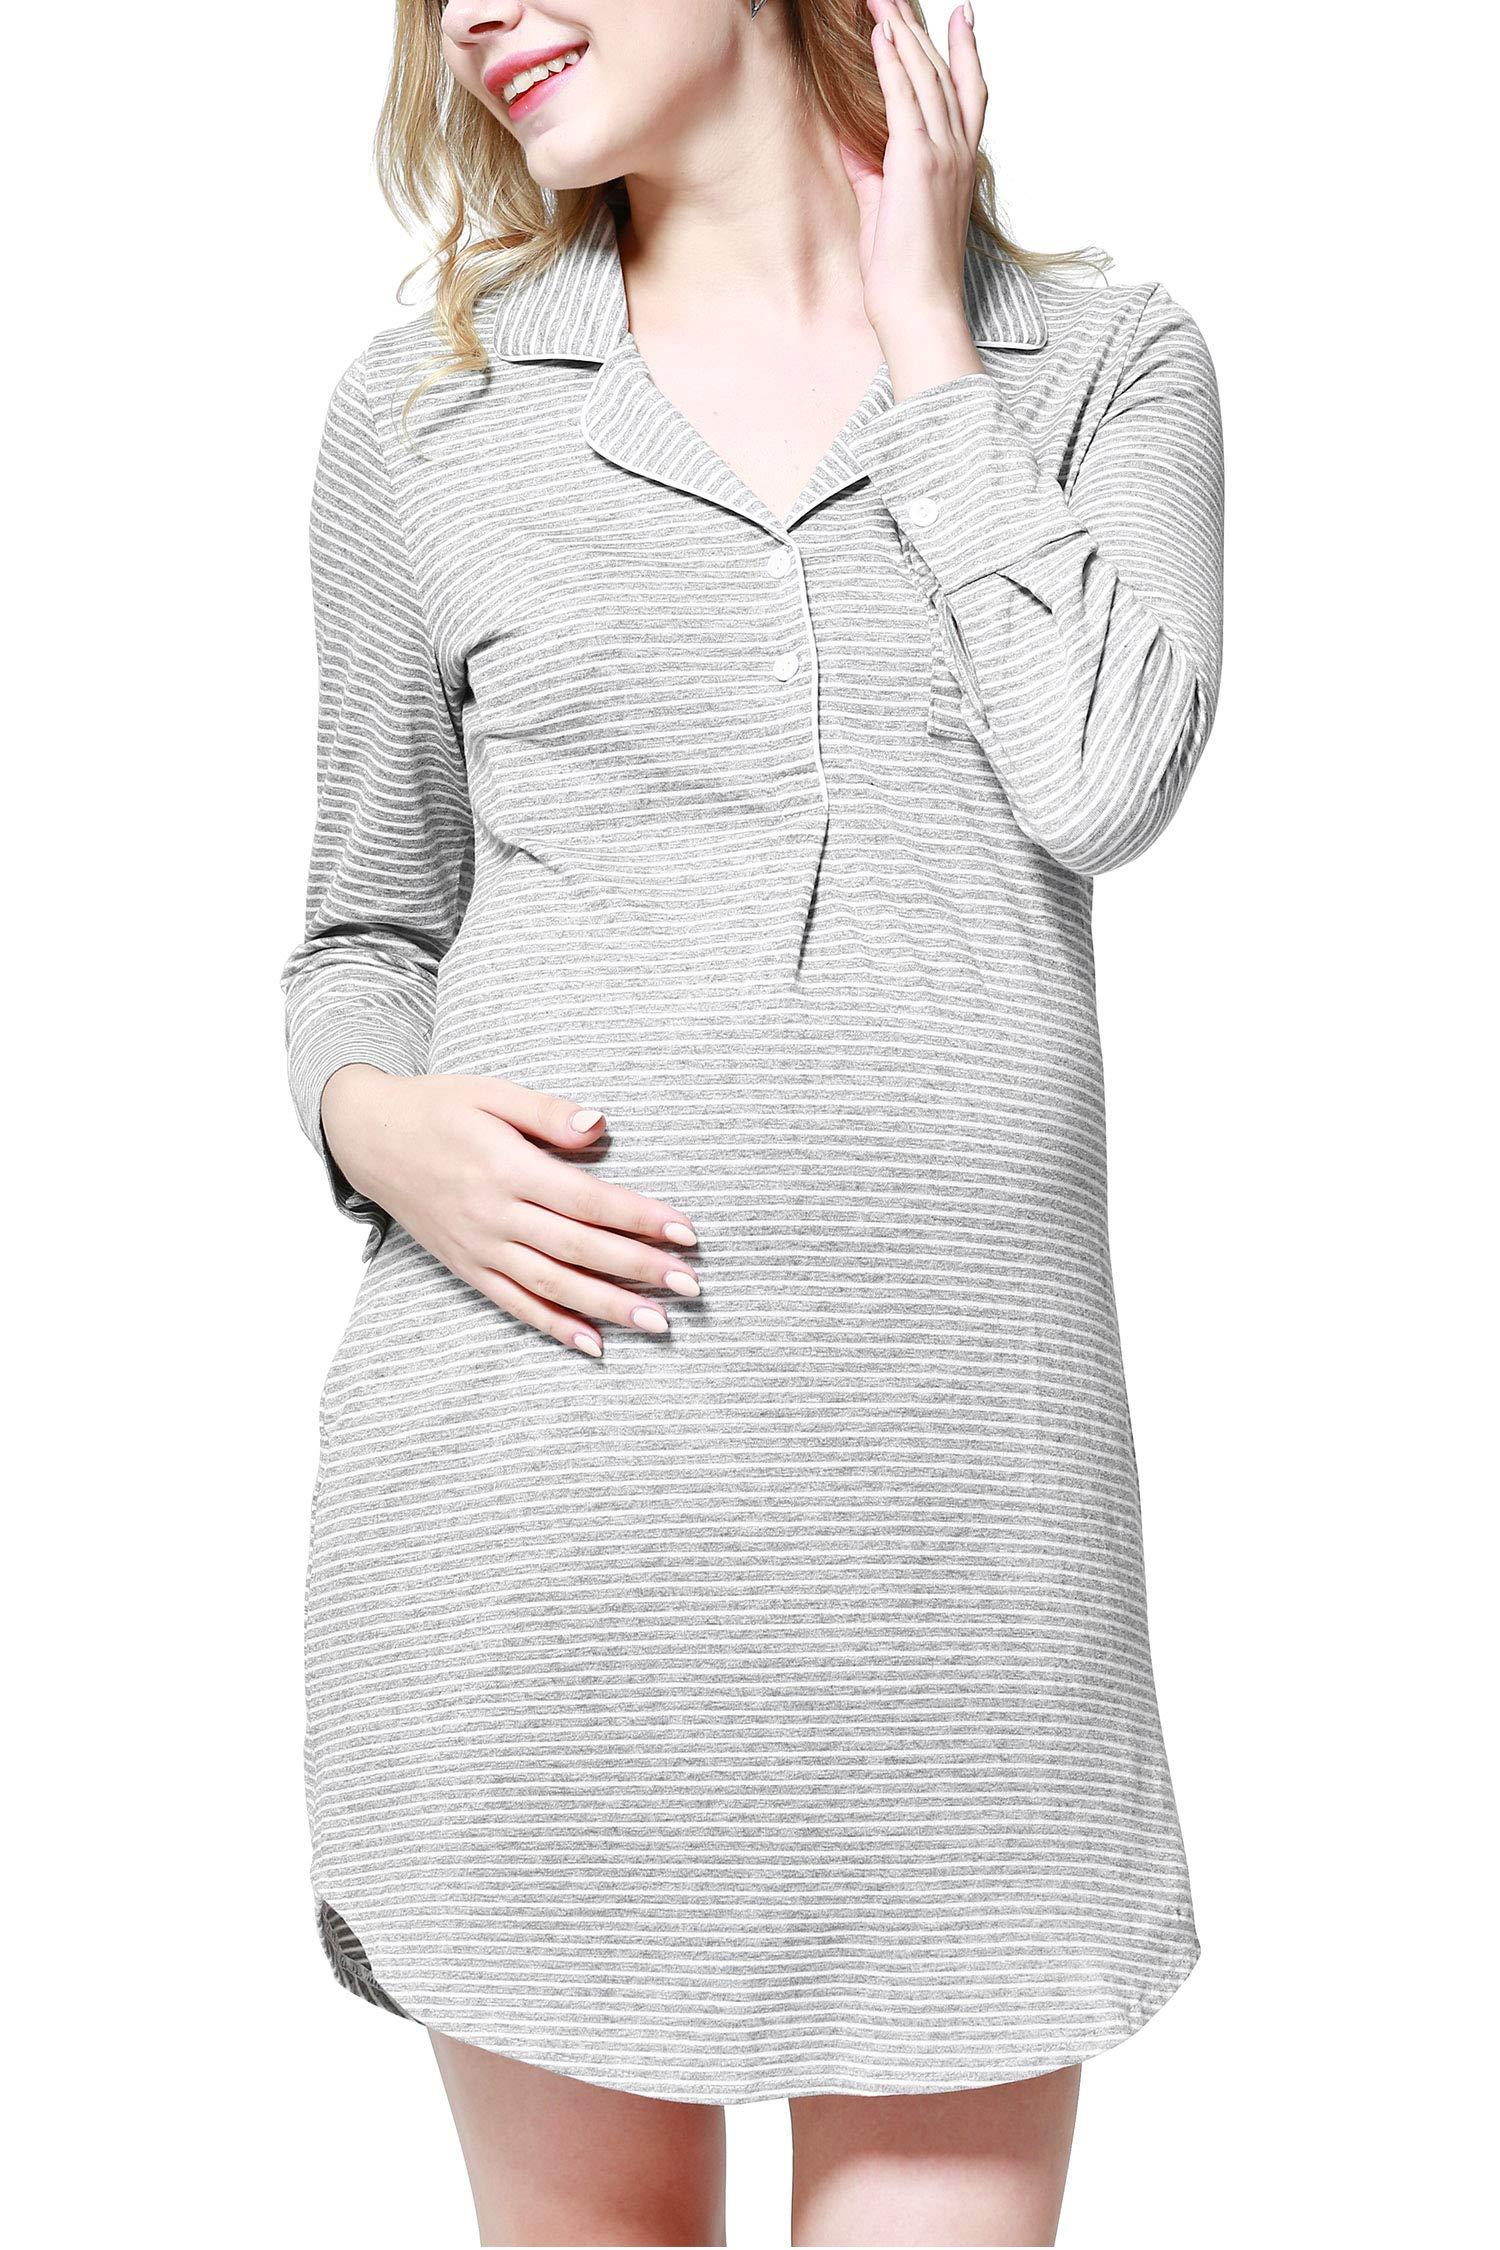 Dance Fairy Molliya Women's Maternity Dress Stripes Nursing Nightgown Breastfeeding,Lapel Collar Pajamas (Gray, M) by Dance Fairy (Image #1)